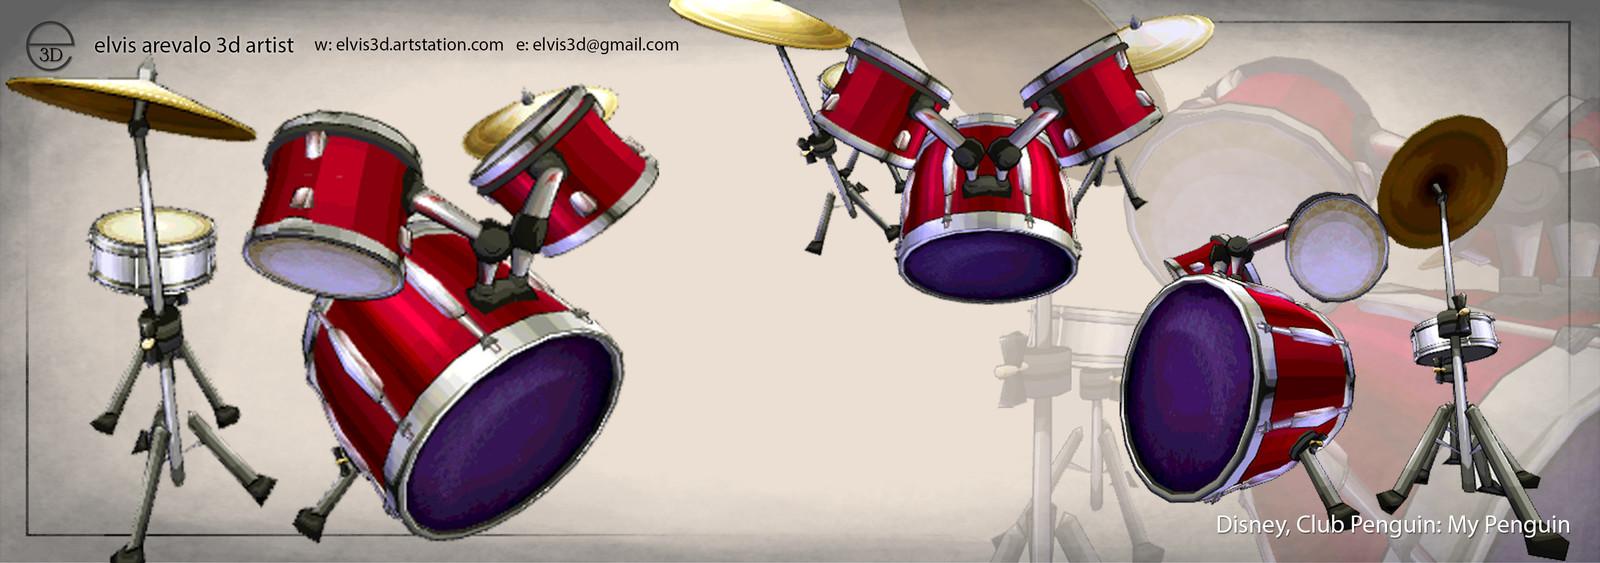 Penguin Drum set Model and texture